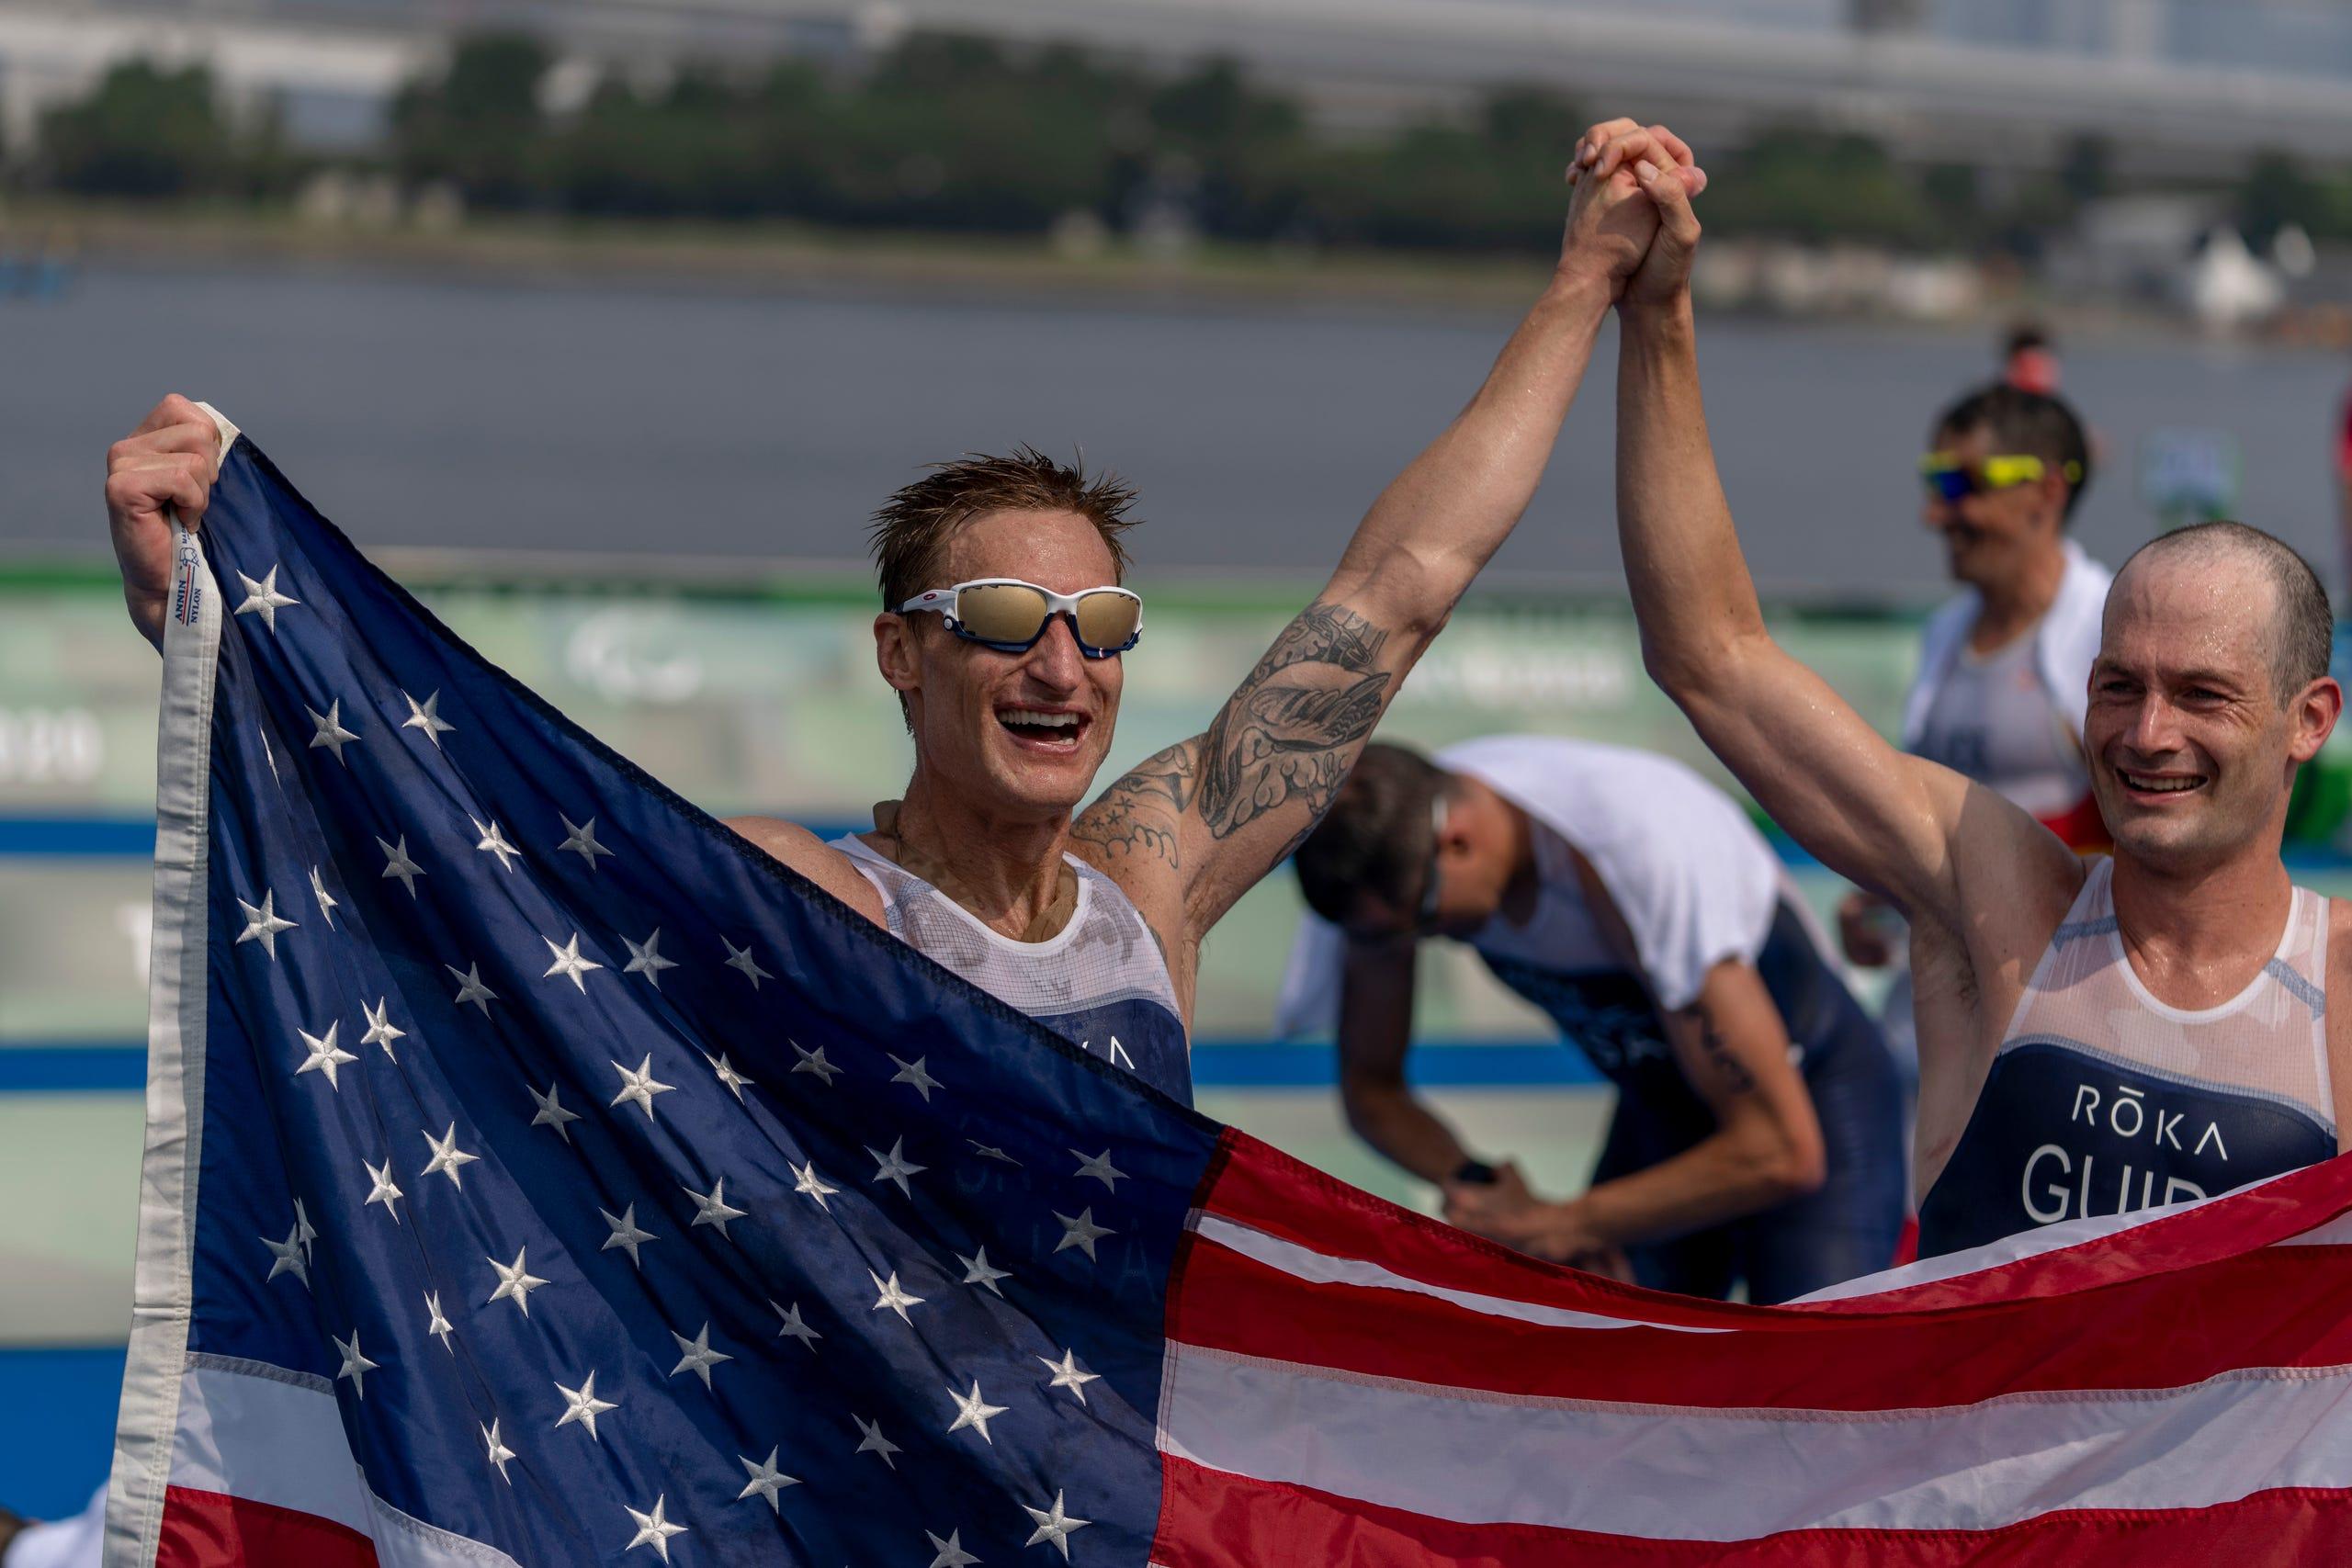 Aug. 27: Team USA's Brad Snyder and guide Greg Billington, celebrate after wining the Men's Triathlon PTV1 at the Odaiba Marine Park.